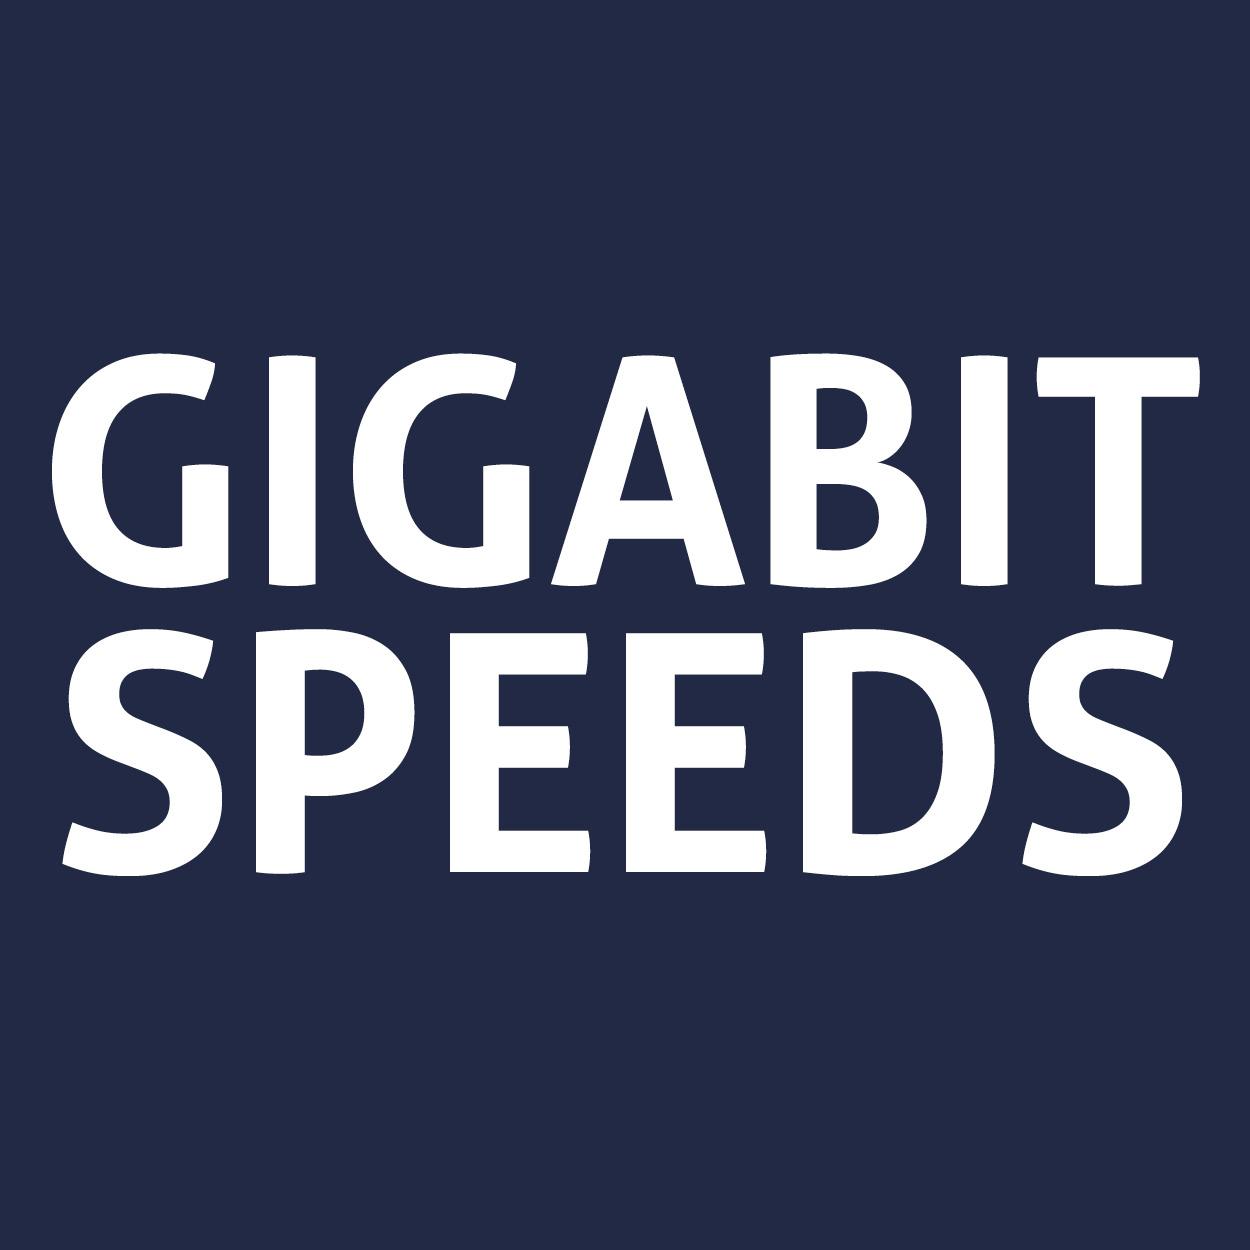 Gigabit speeds